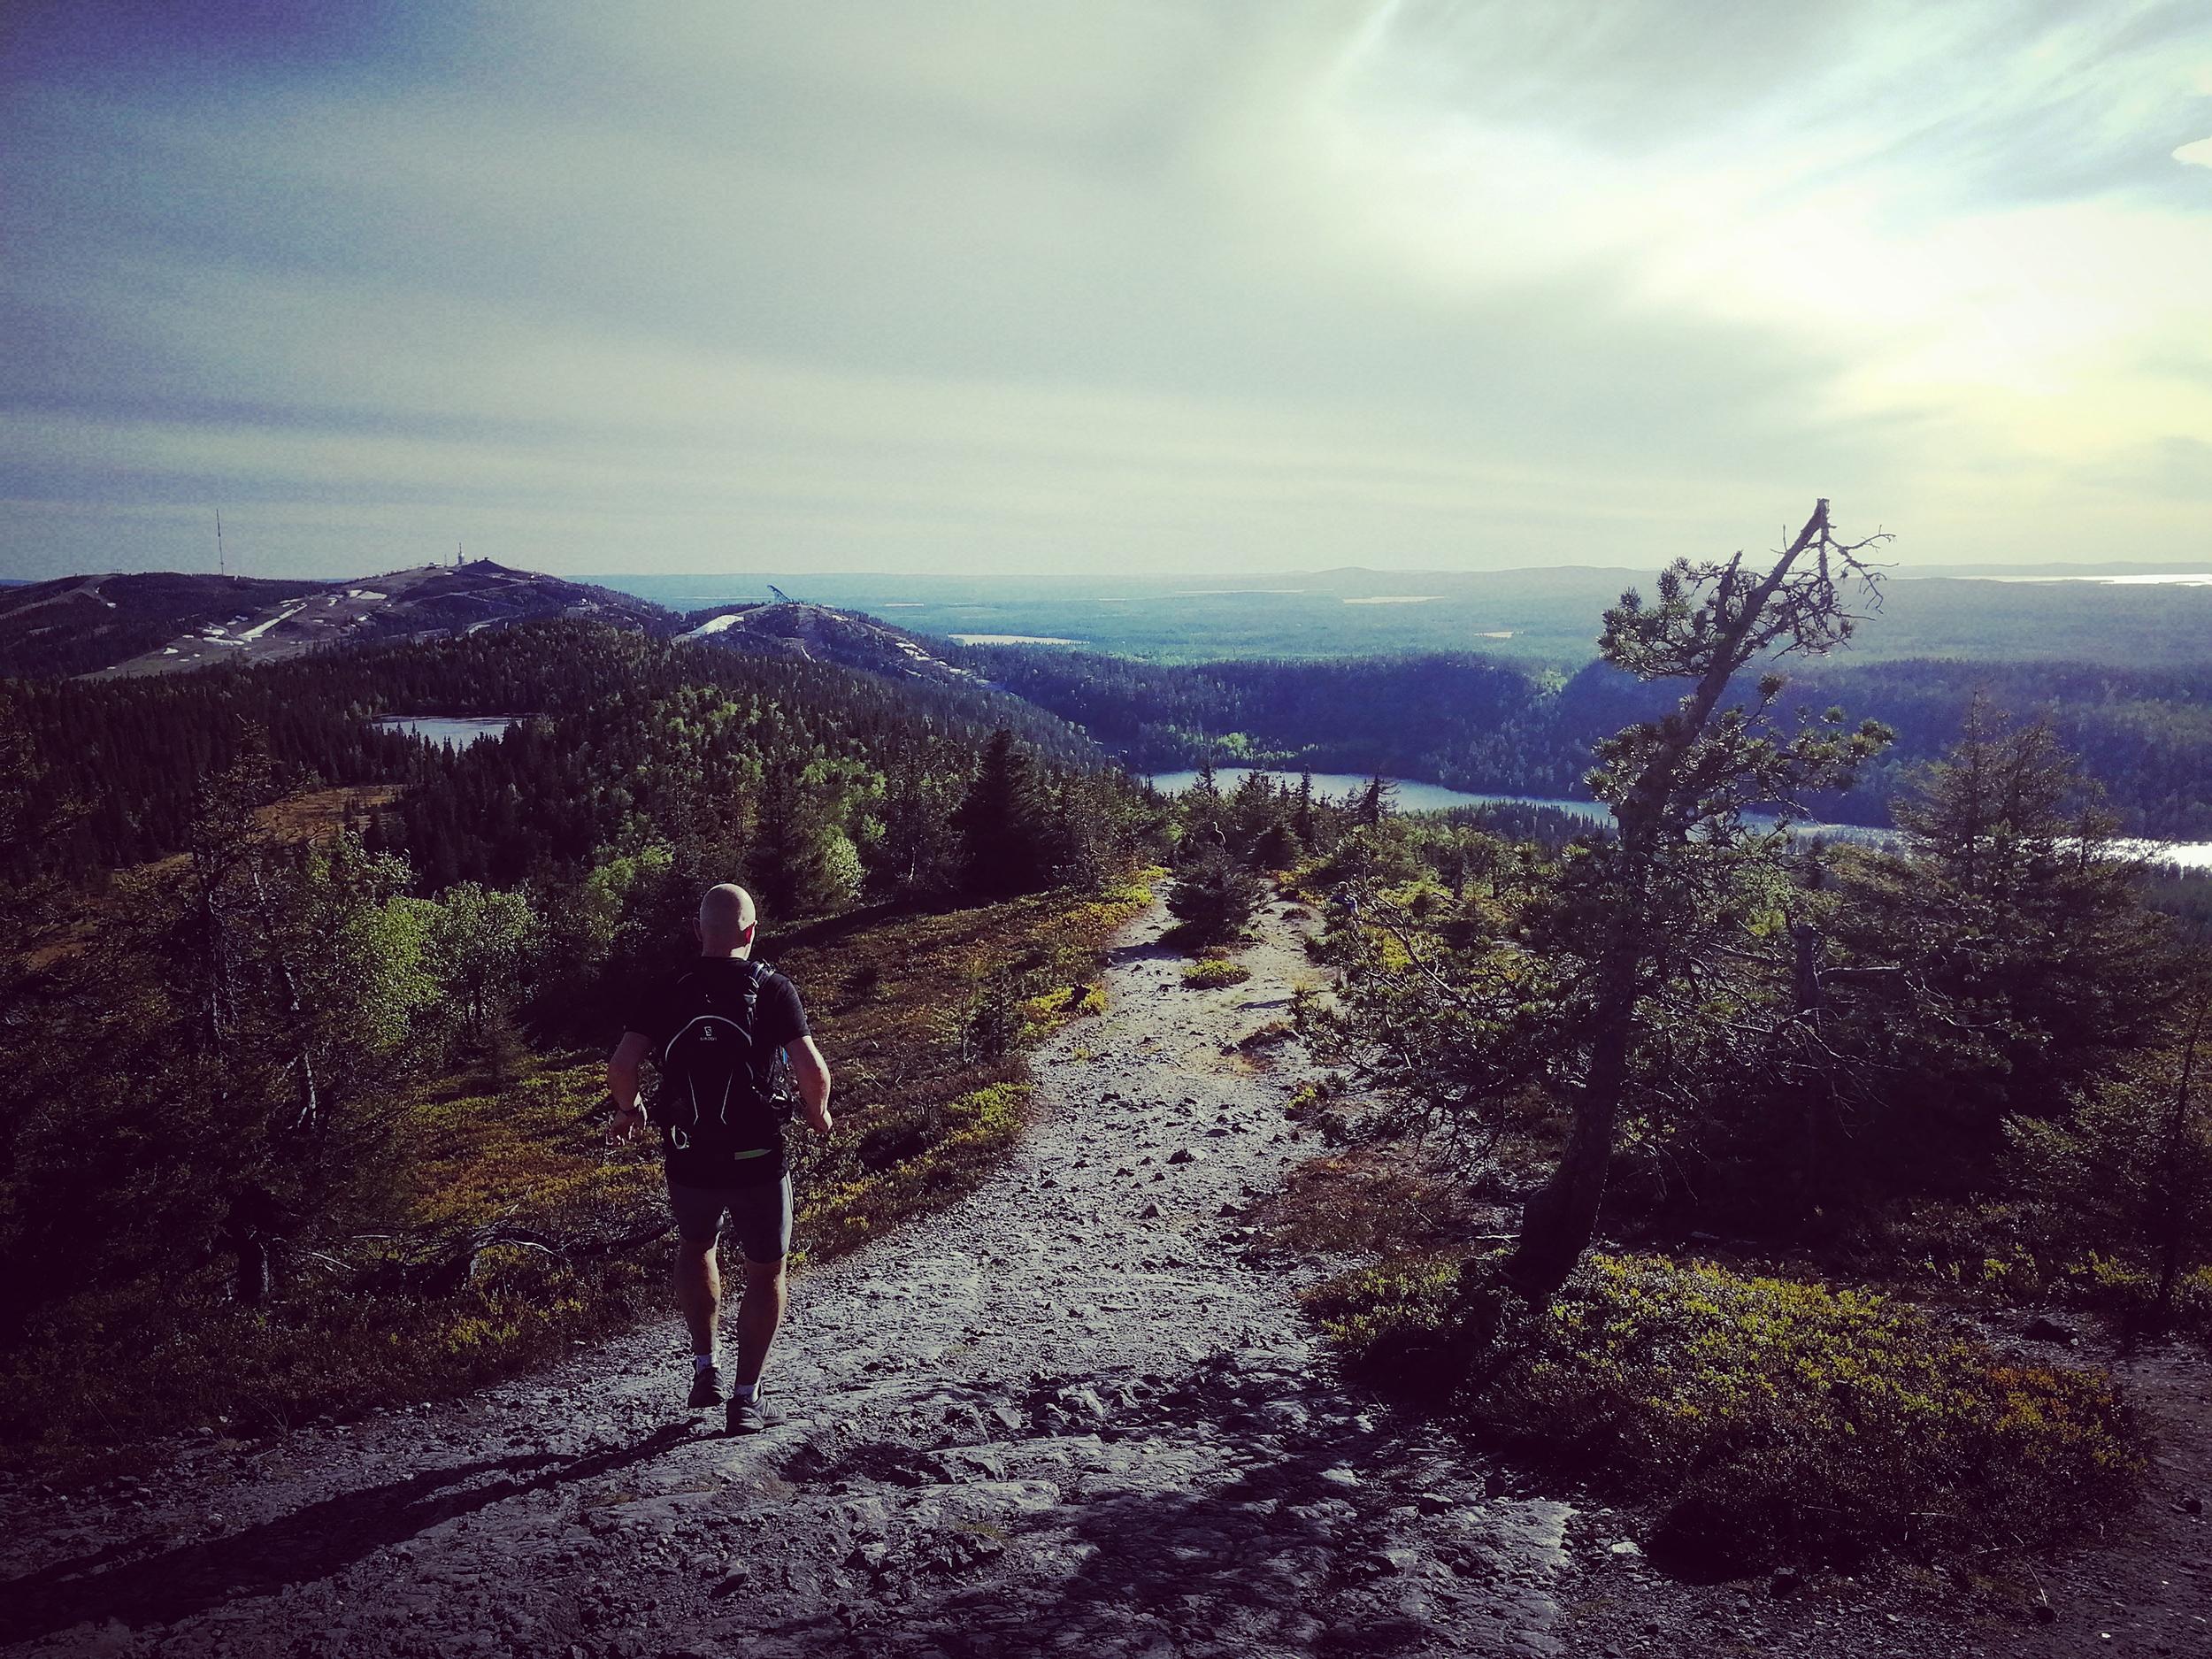 Balanserat-trail-running-03.jpg